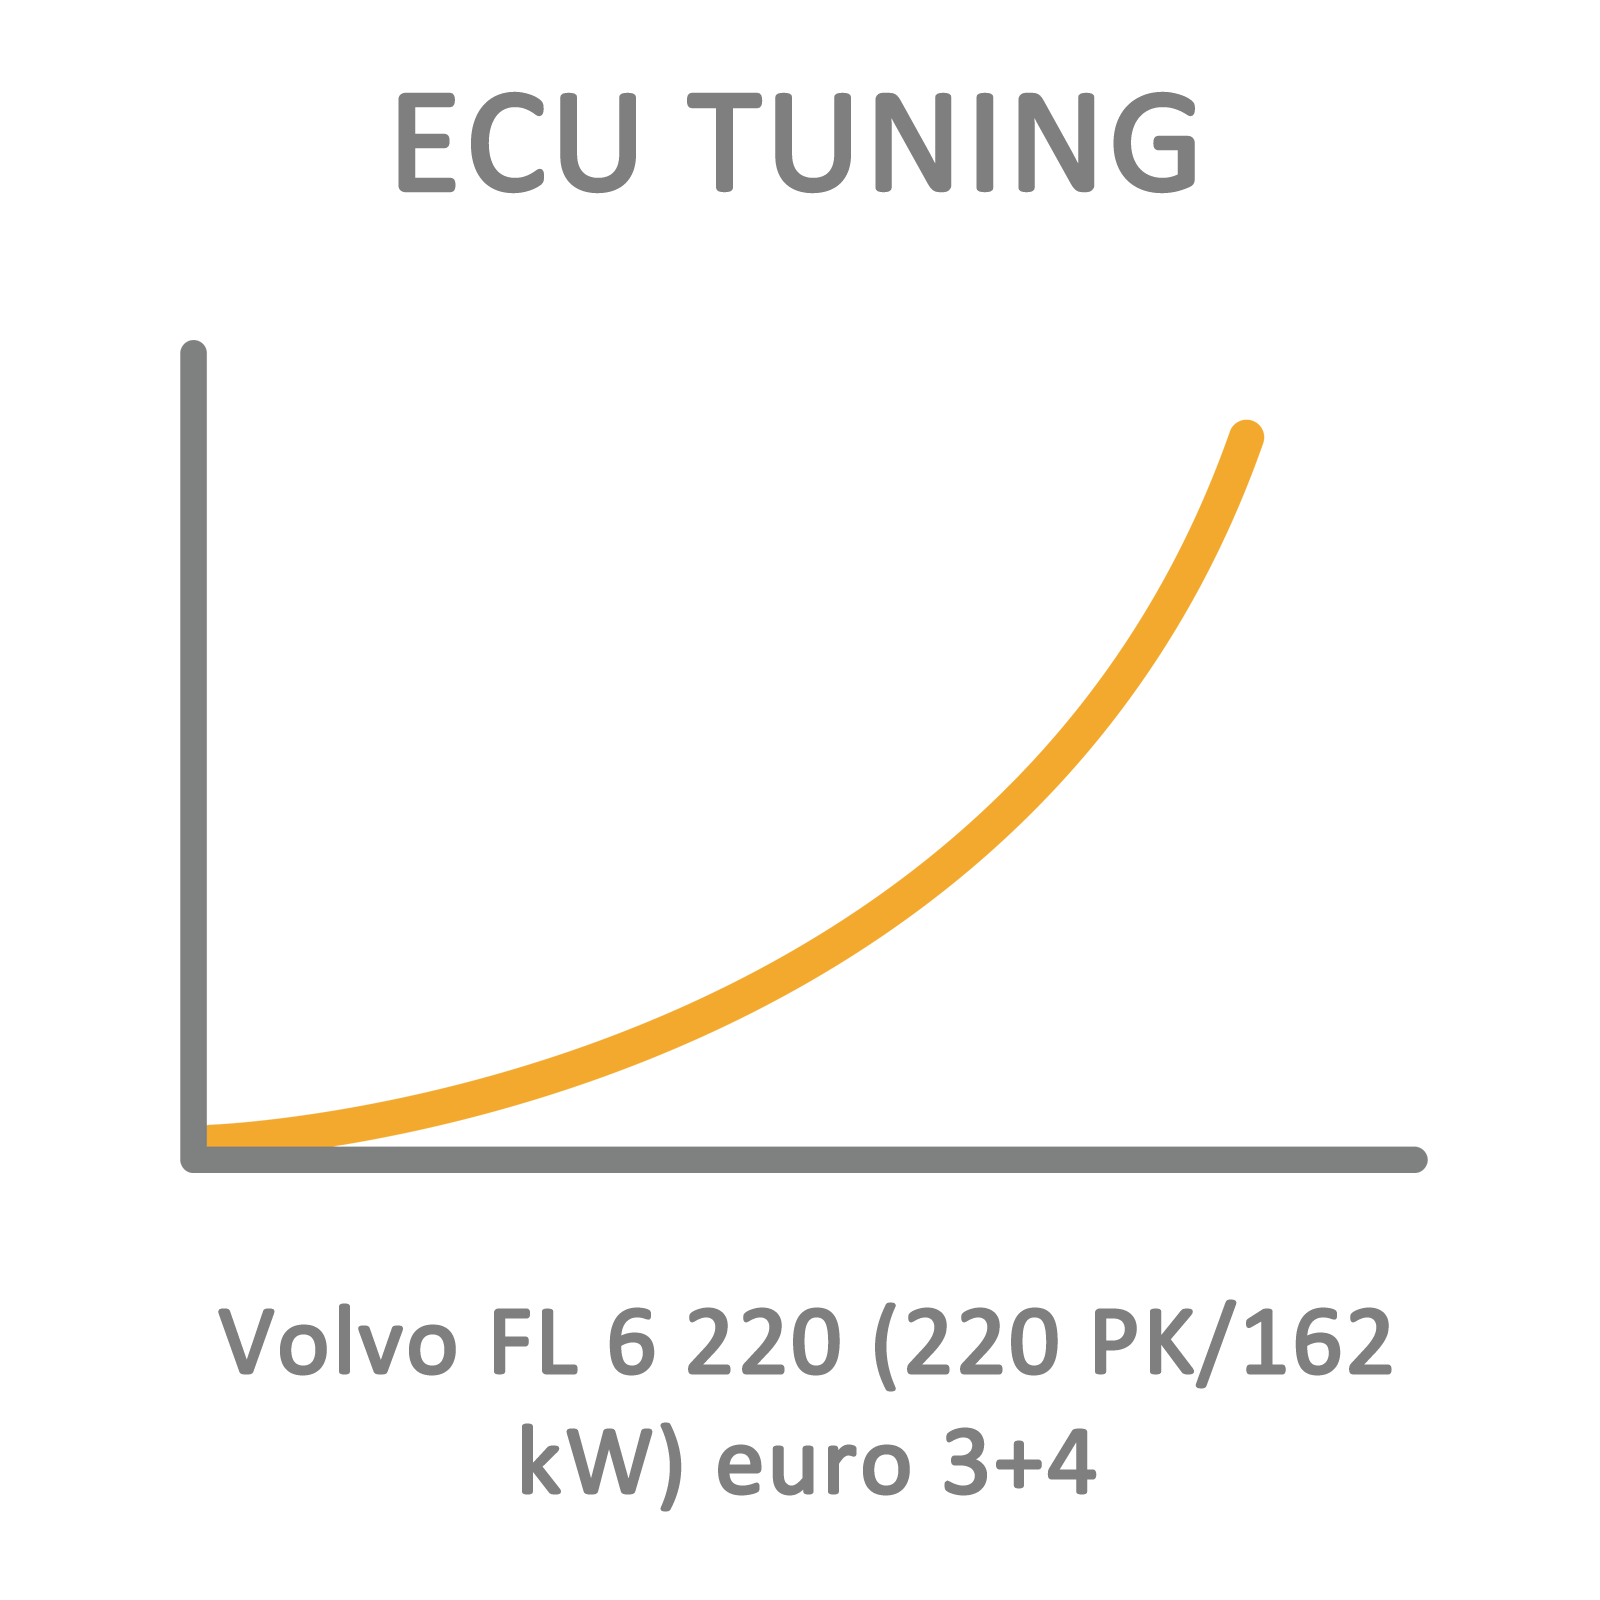 Volvo Fl 6 220 220 Pk 162 Kw Euro 3 4 Ecu Tuning